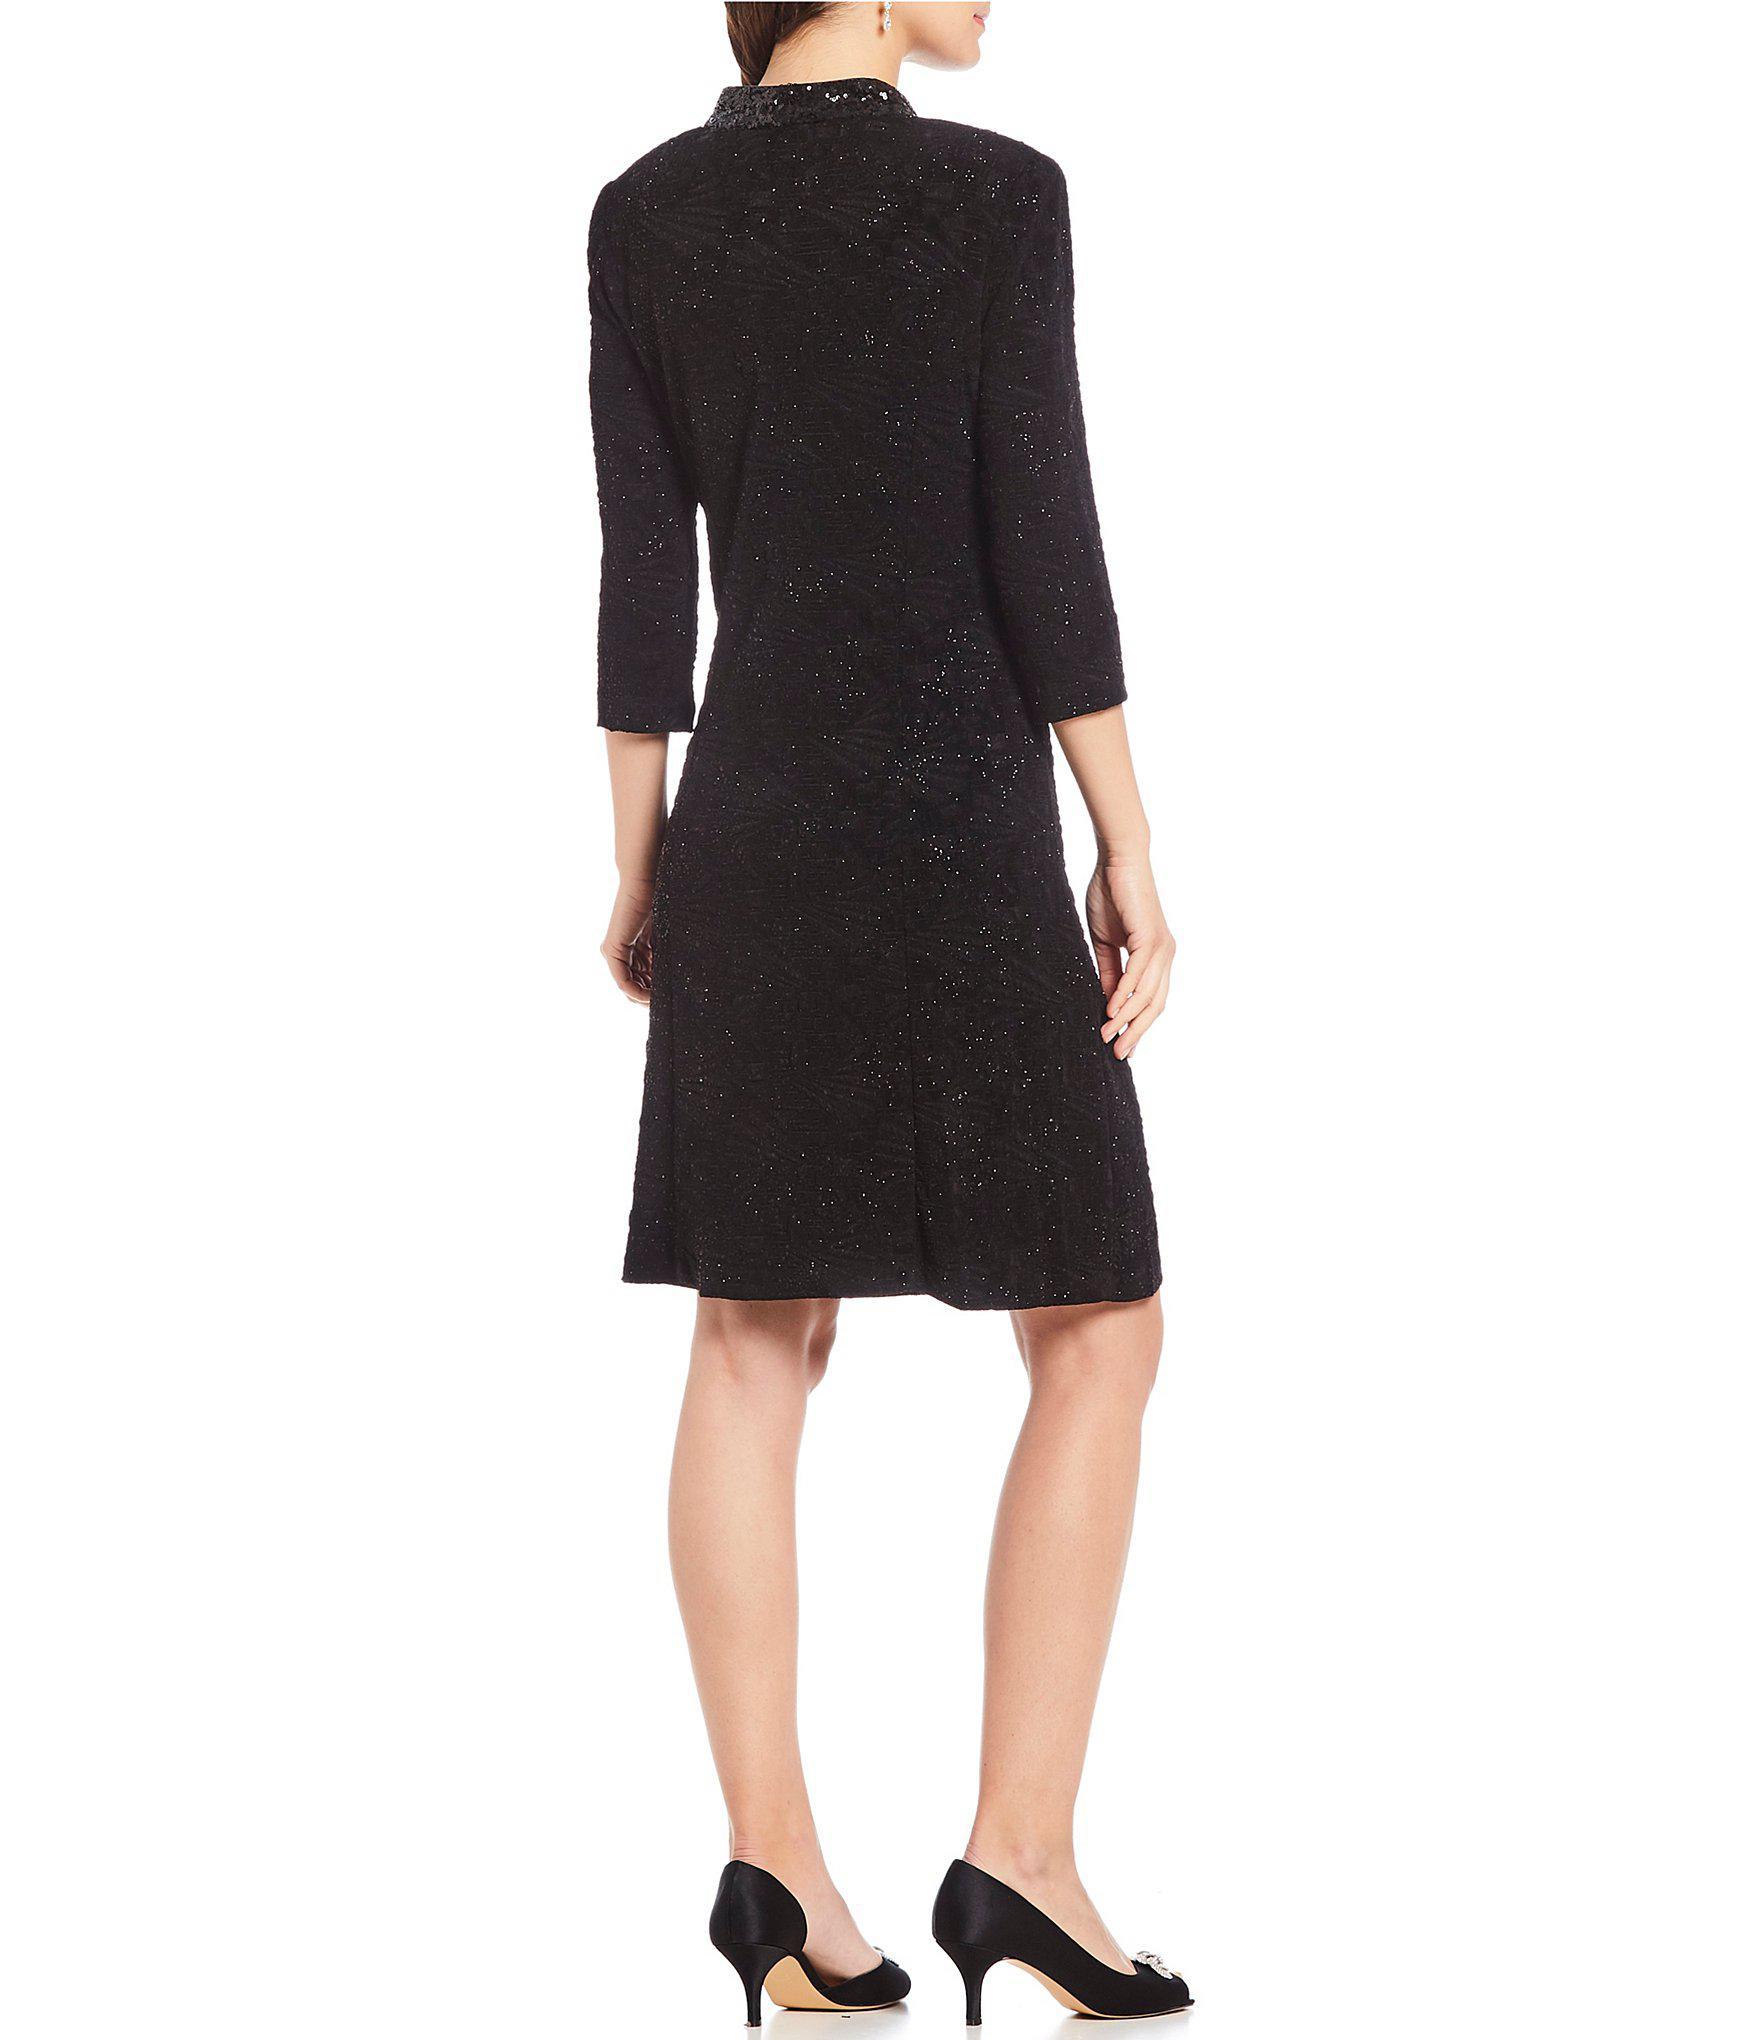 8825dd4badf Lyst - Alex Evenings Petite Size Glitter Jacquard Sequin Trim Jacket ...